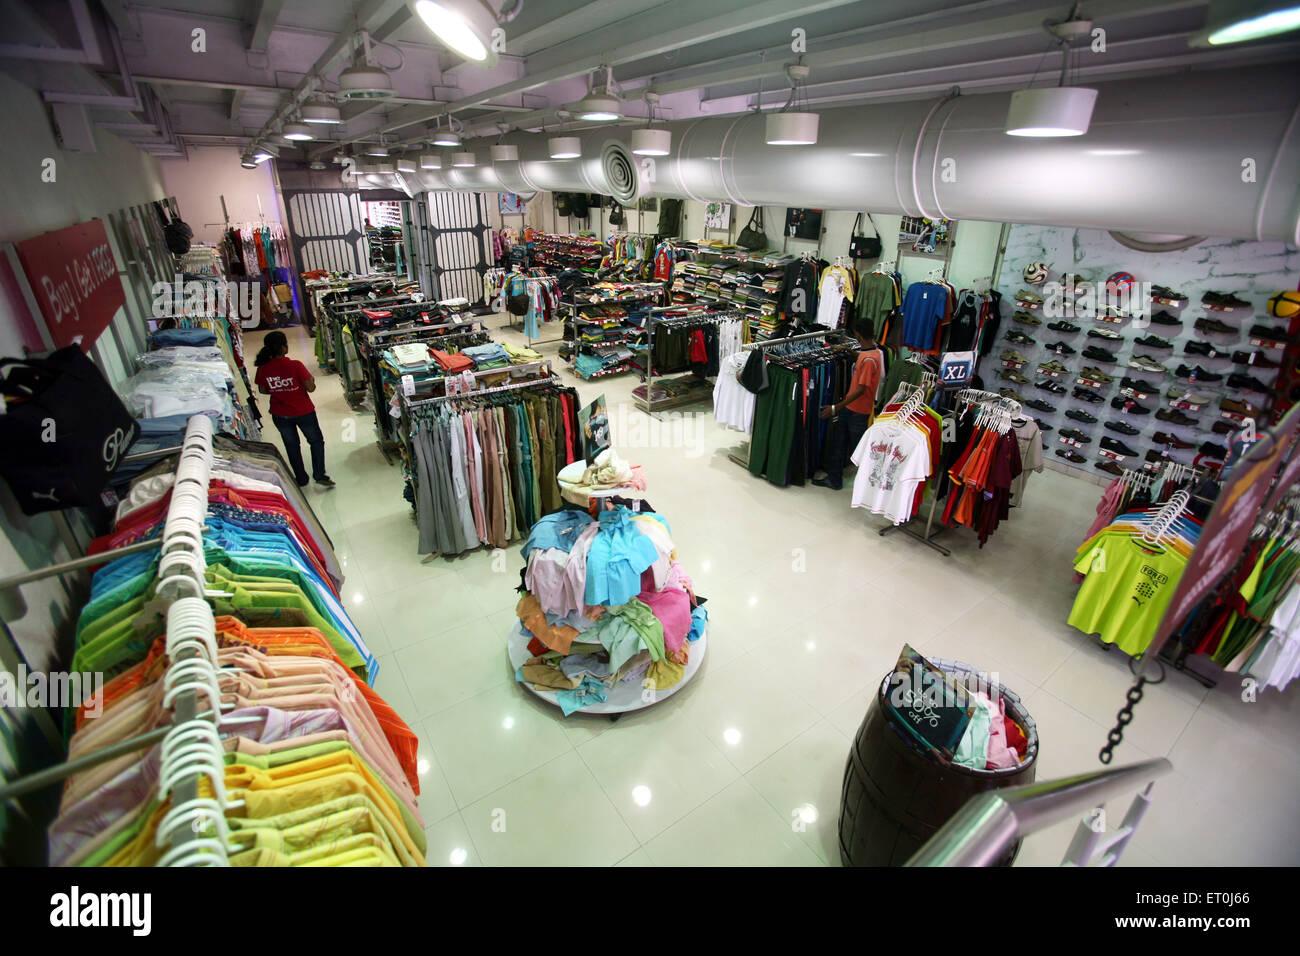 View of the Loot store located in Andheri ; Bombay Mumbai ; Maharashtra ; India - Stock Image